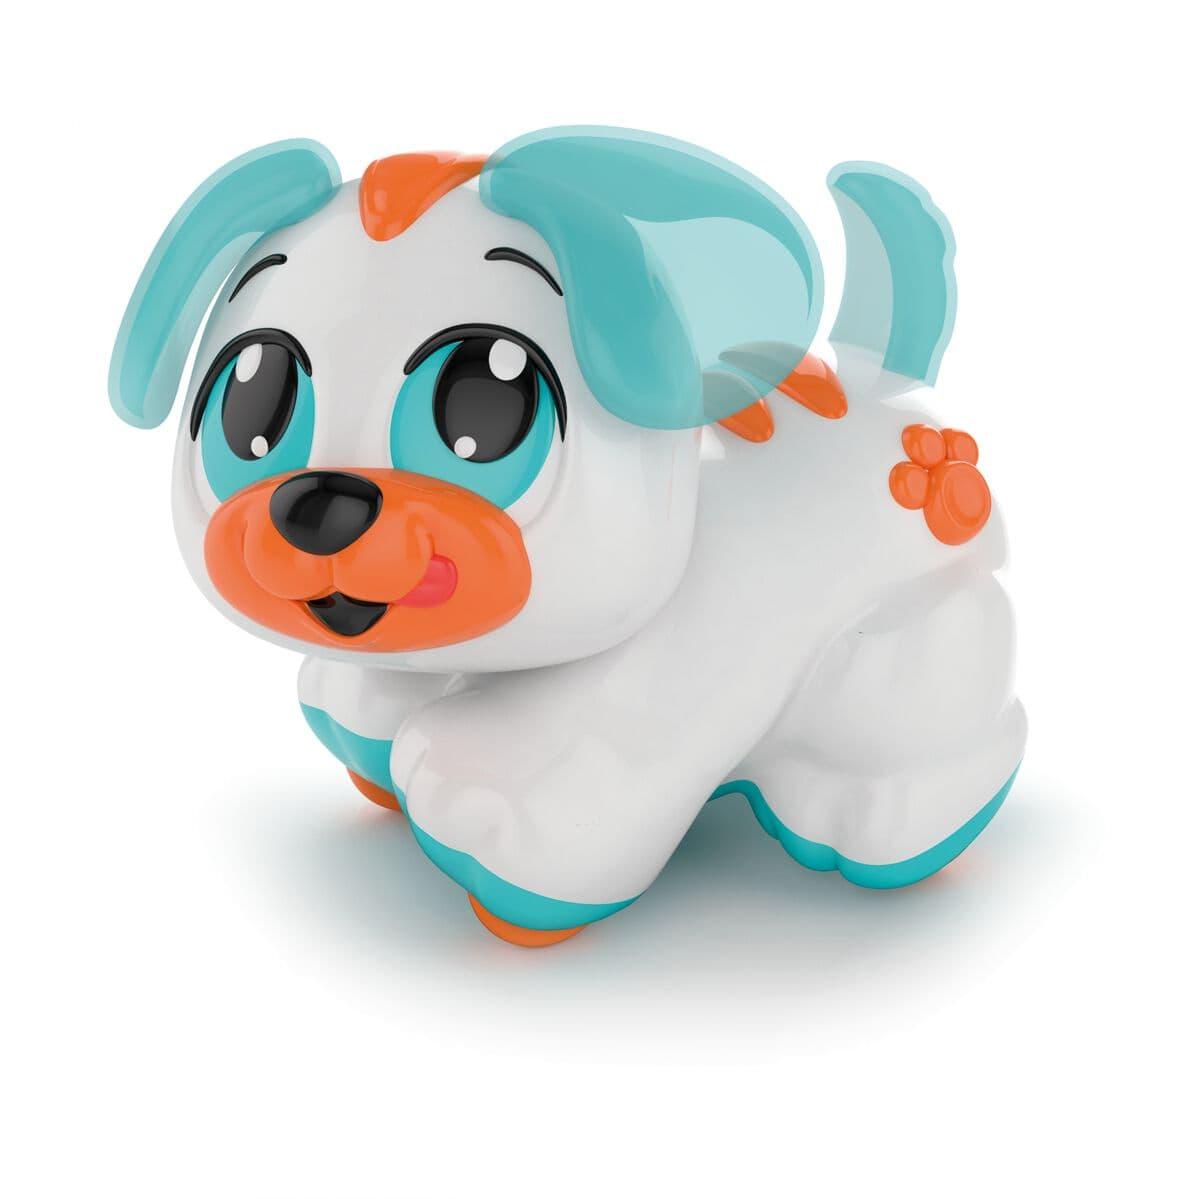 Clementoni Emotional Dog (IT) Lernspiel